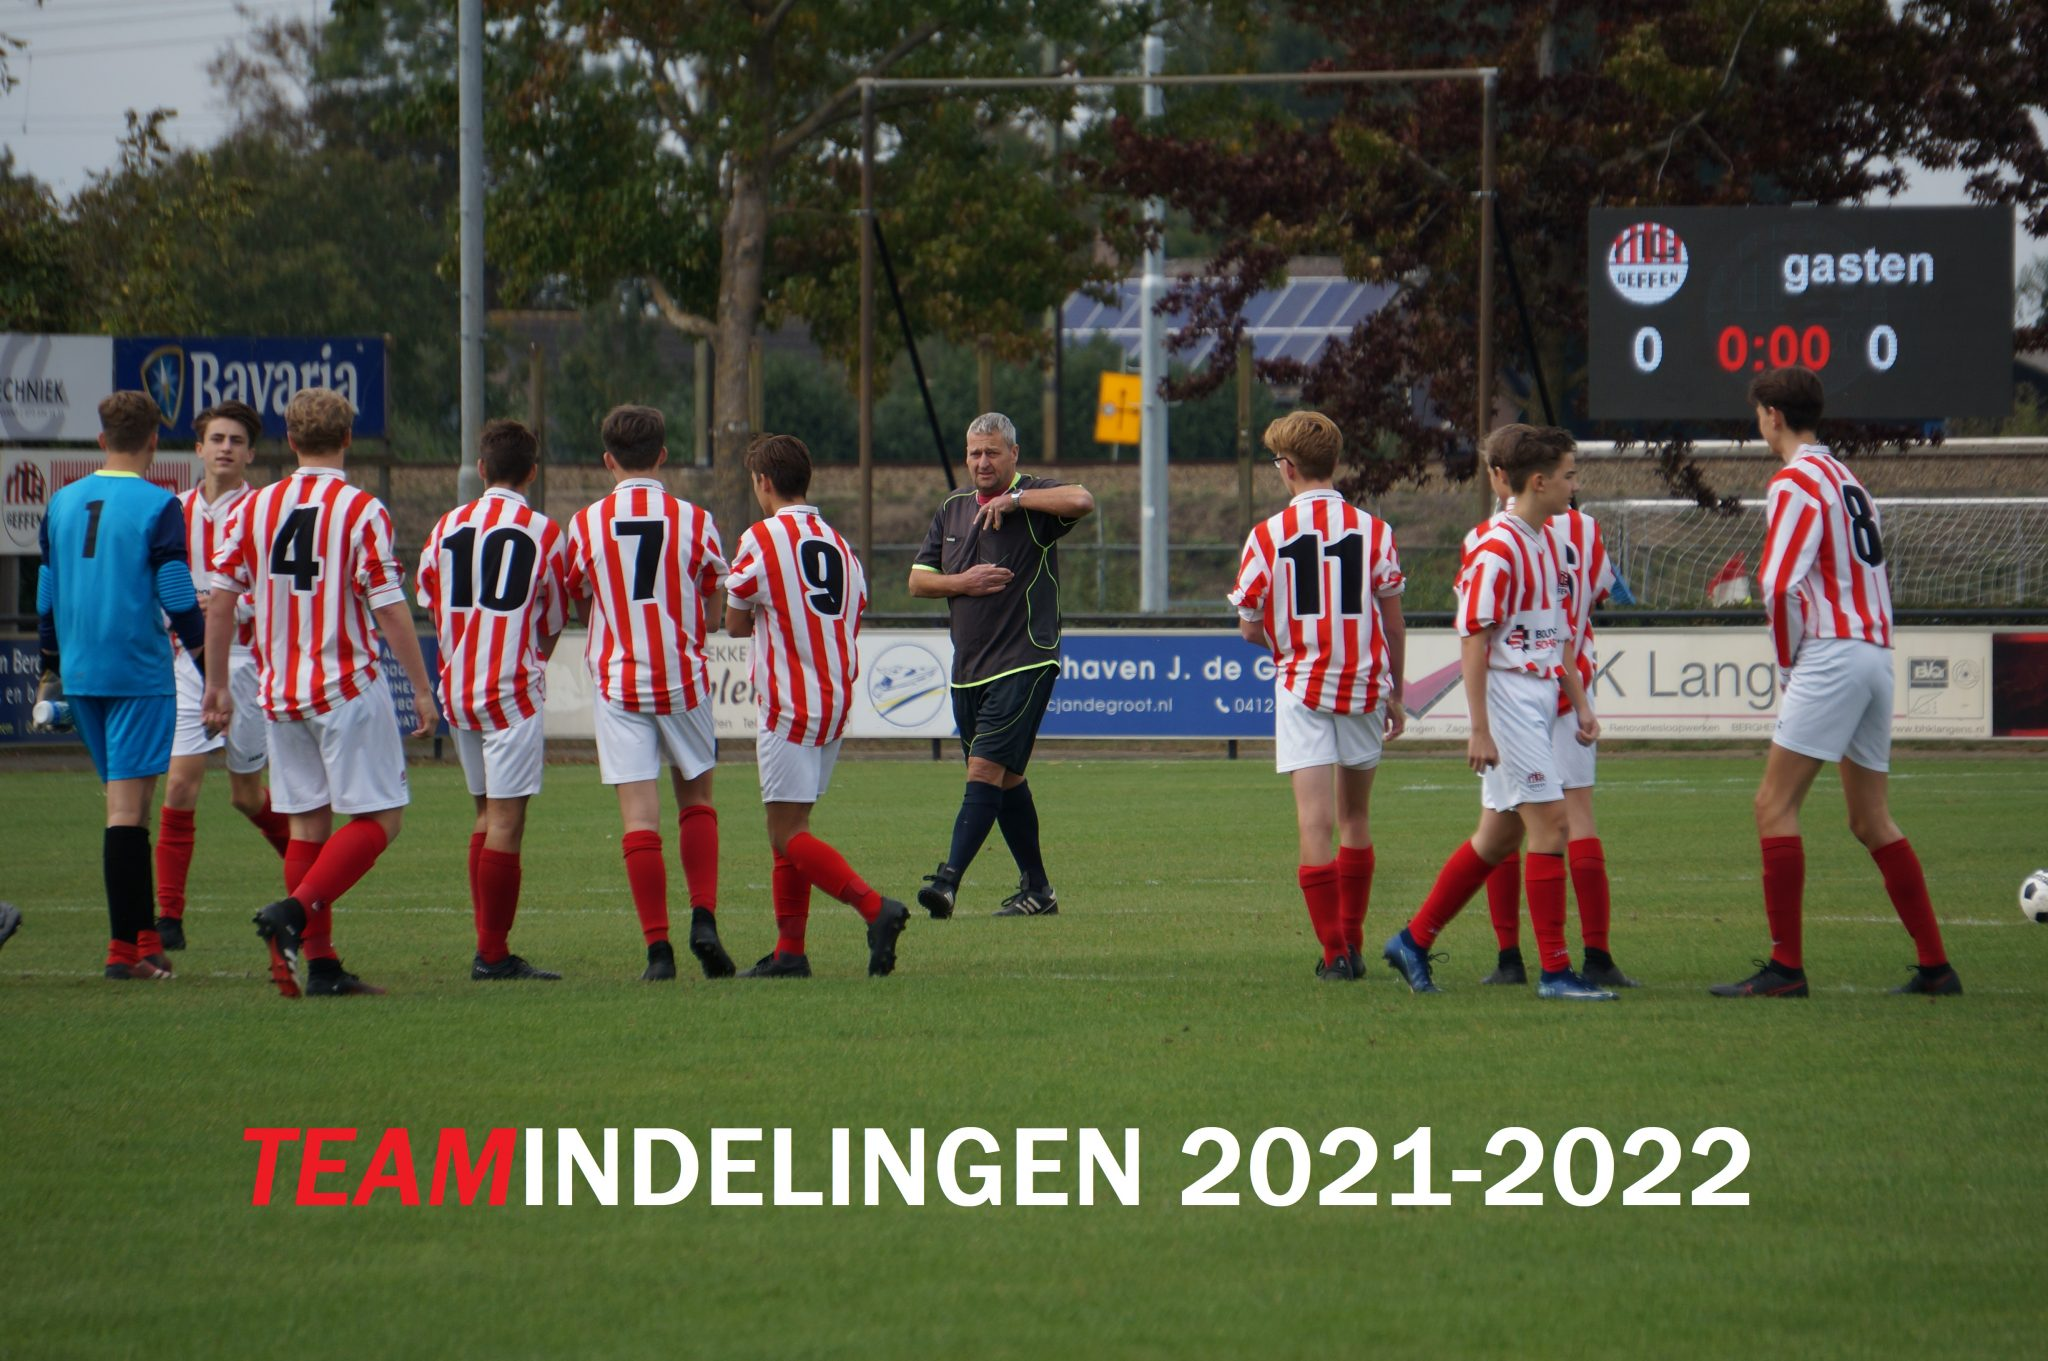 Indelingen teams seizoen 2021-2022